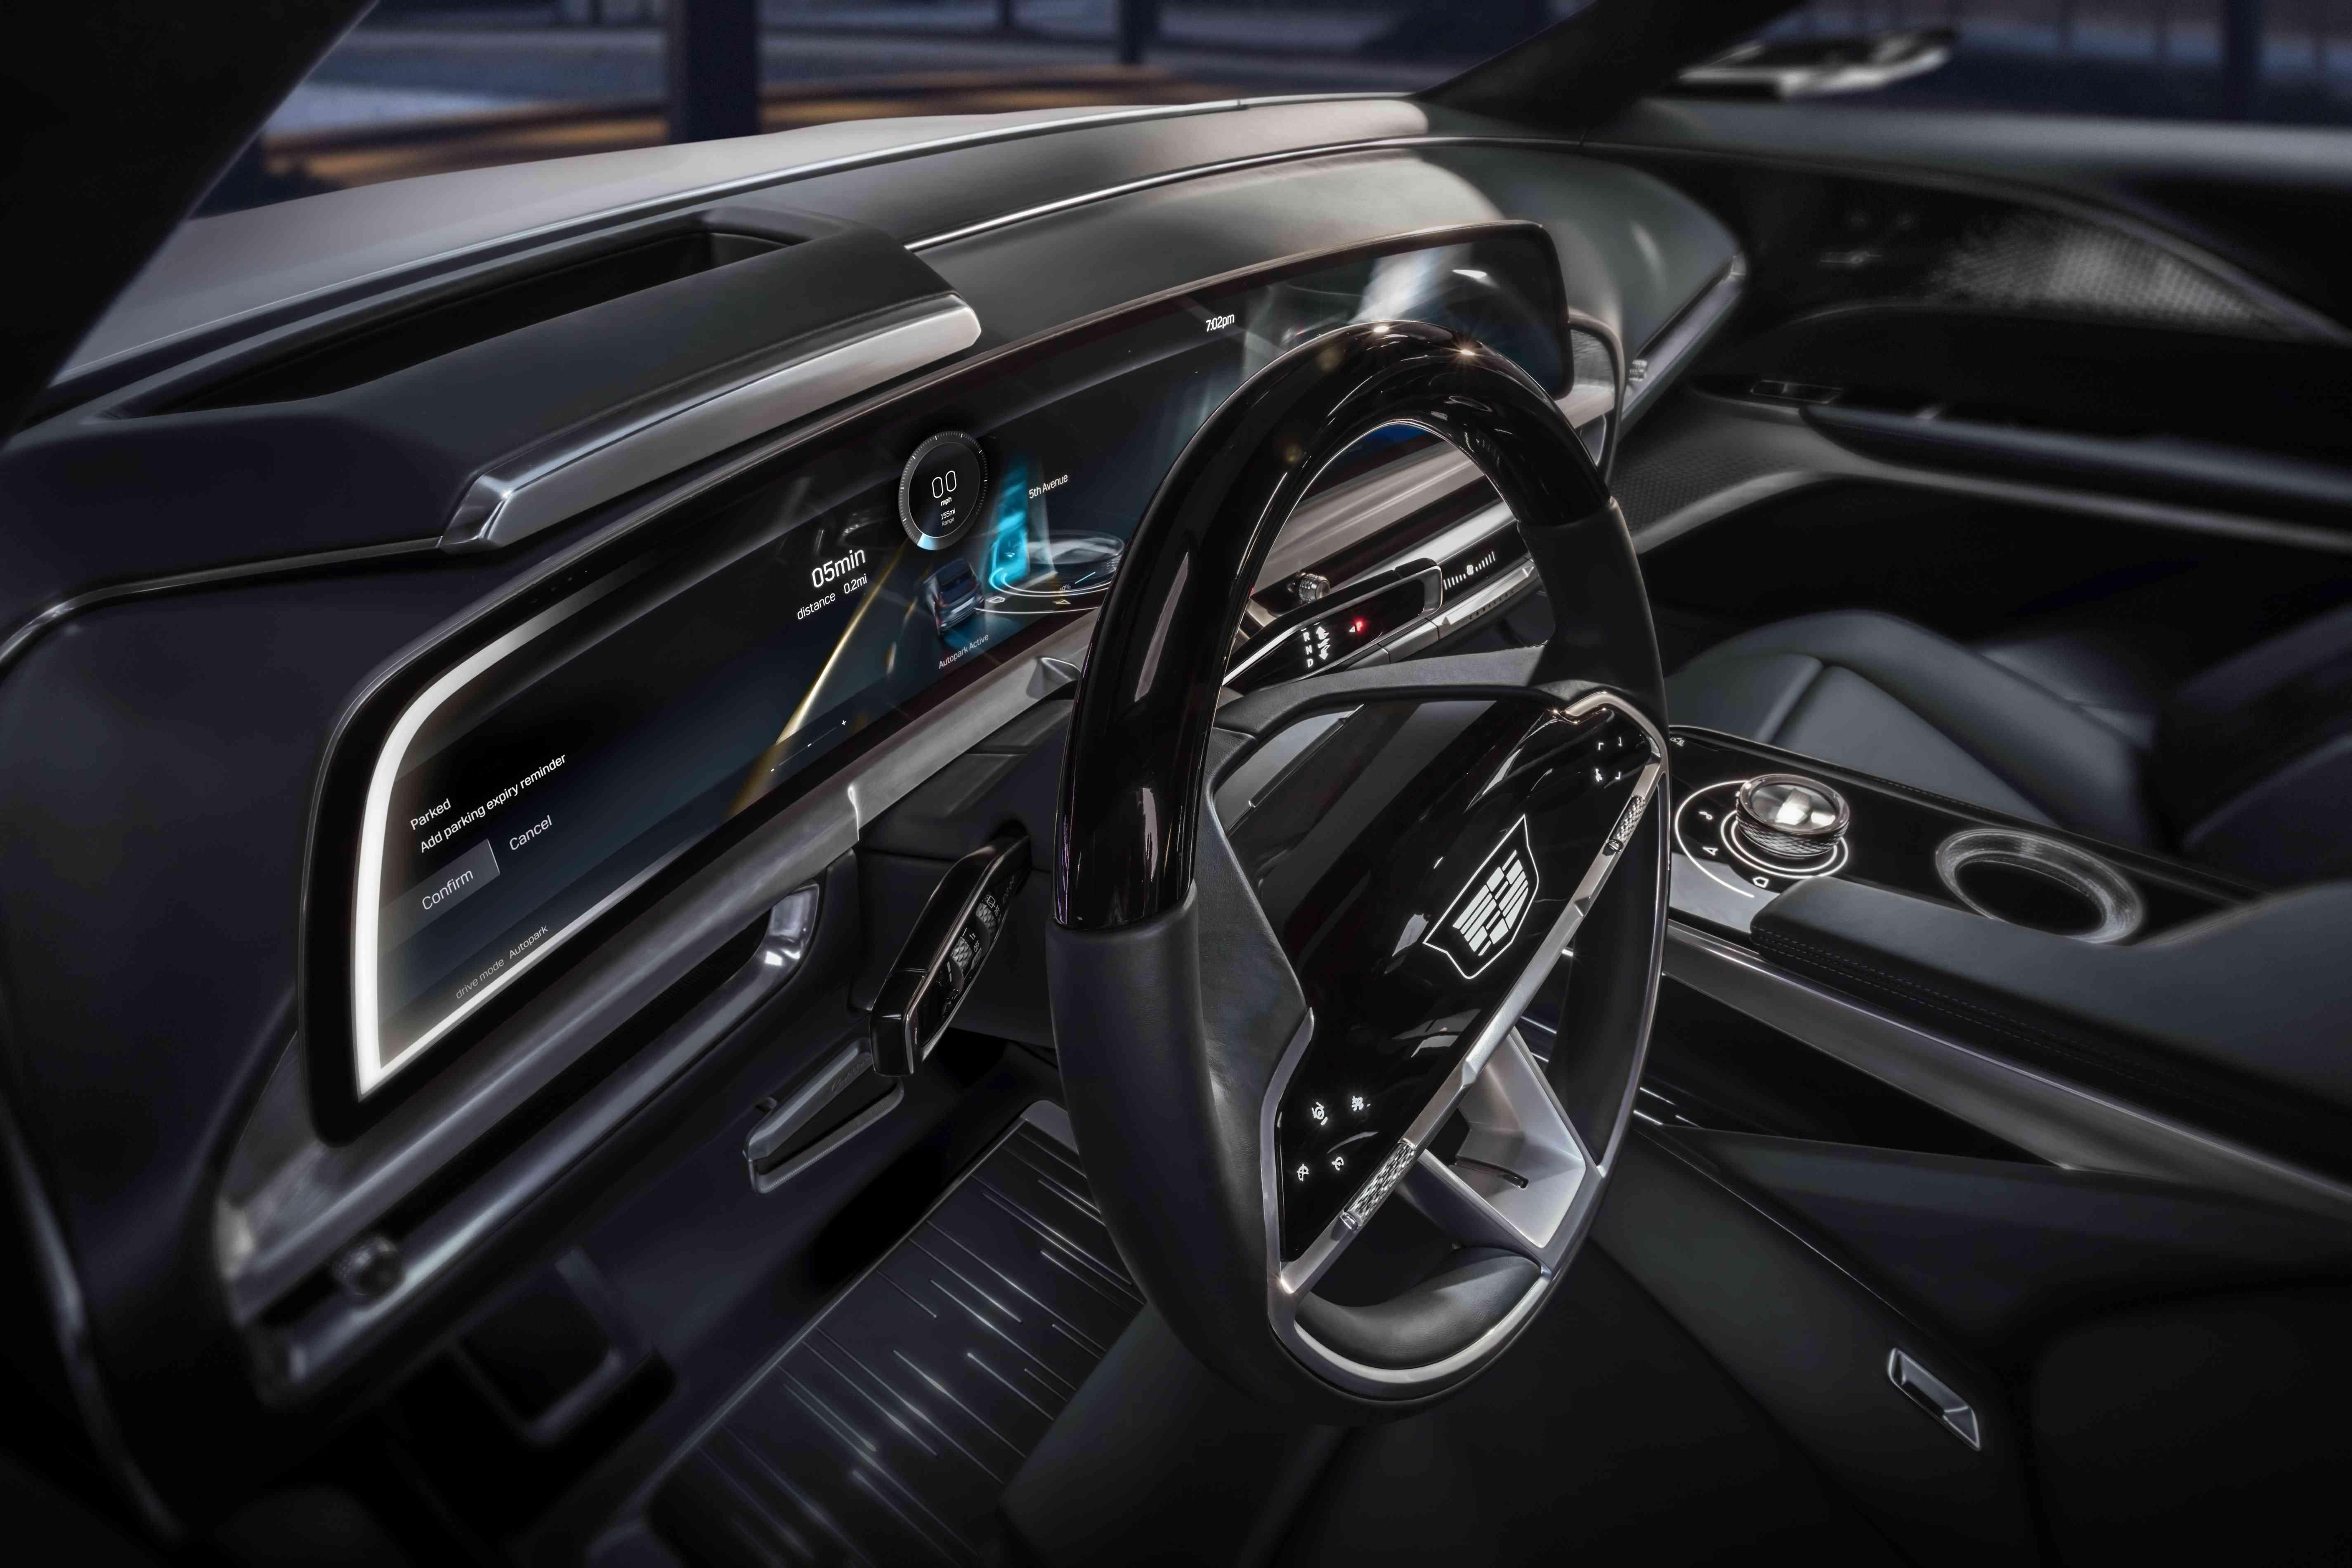 Cadillac Touchscreen Display